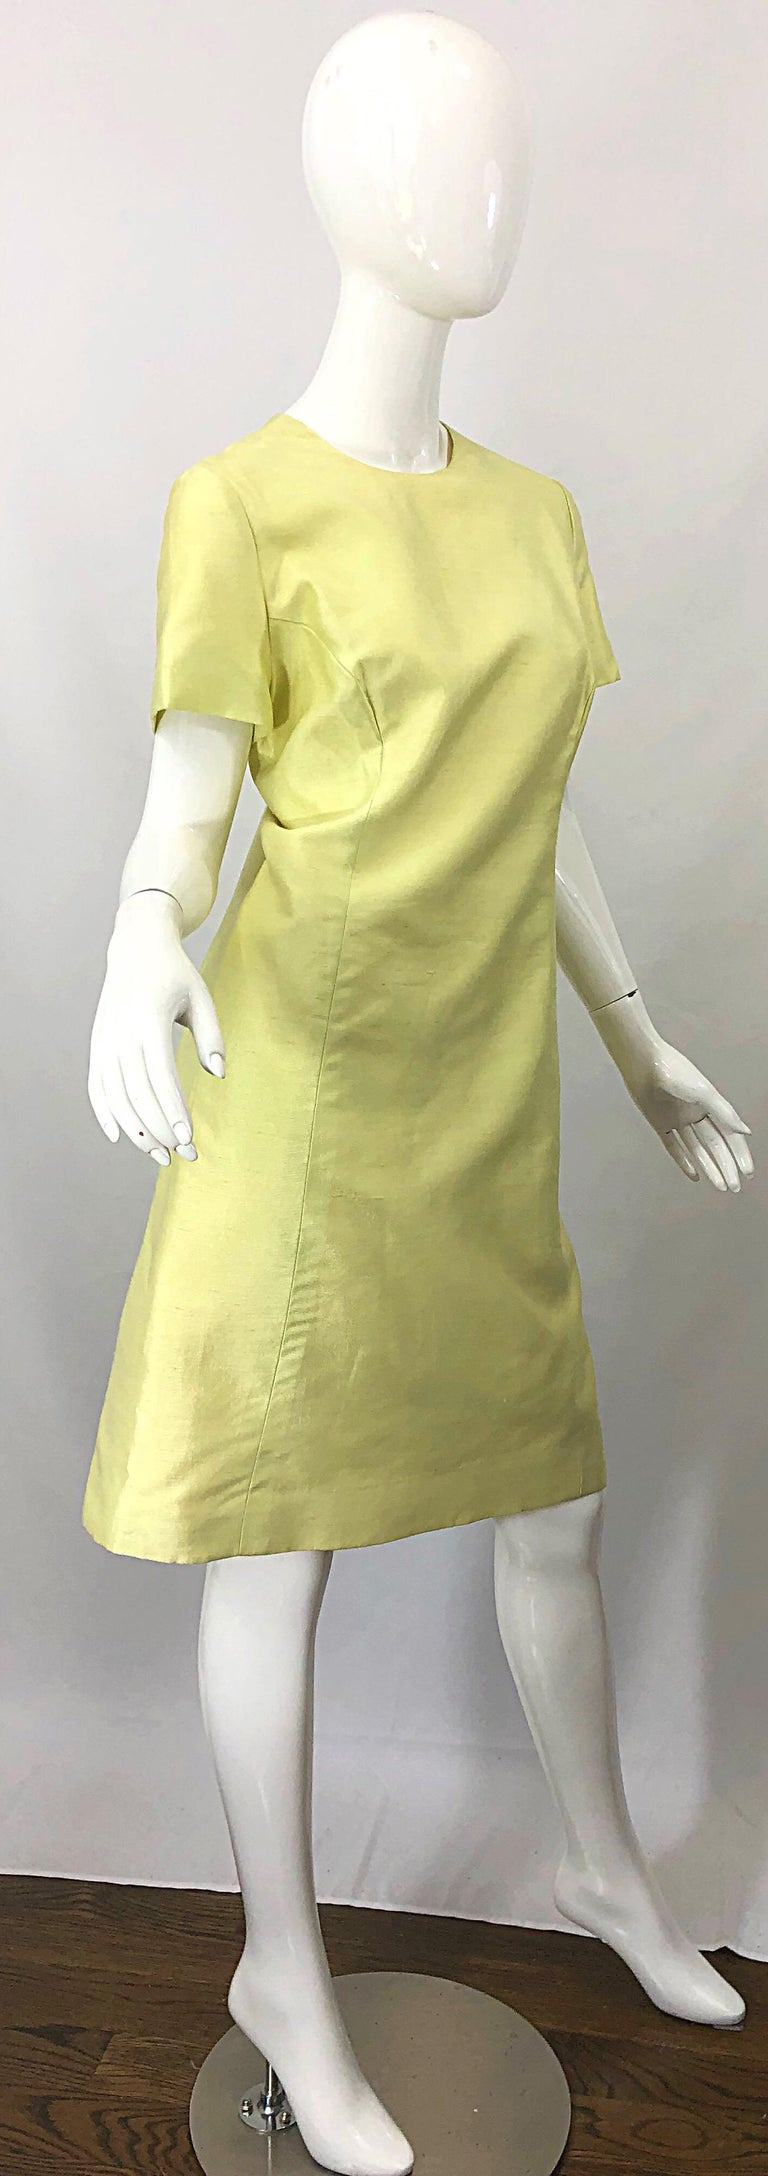 1960s Jack Bryan Yellow Silk Rhinestone Beaded 60s A-Line Dress + Jacket Suit For Sale 2